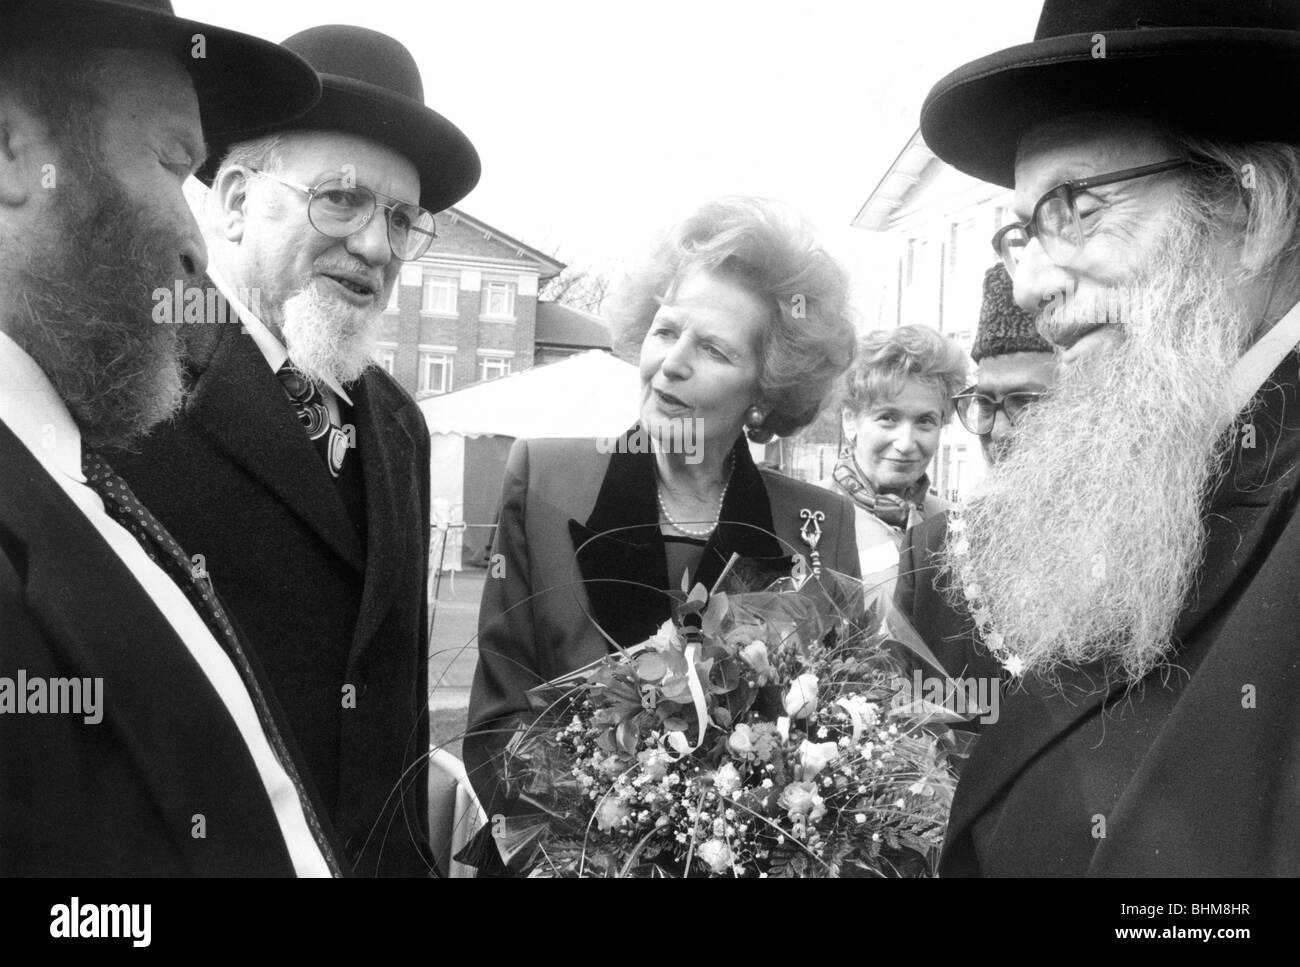 Margaret Thatcher with Jewish elders, Stoke Newington, London, 1995. Artist: John Nathan Stock Photo